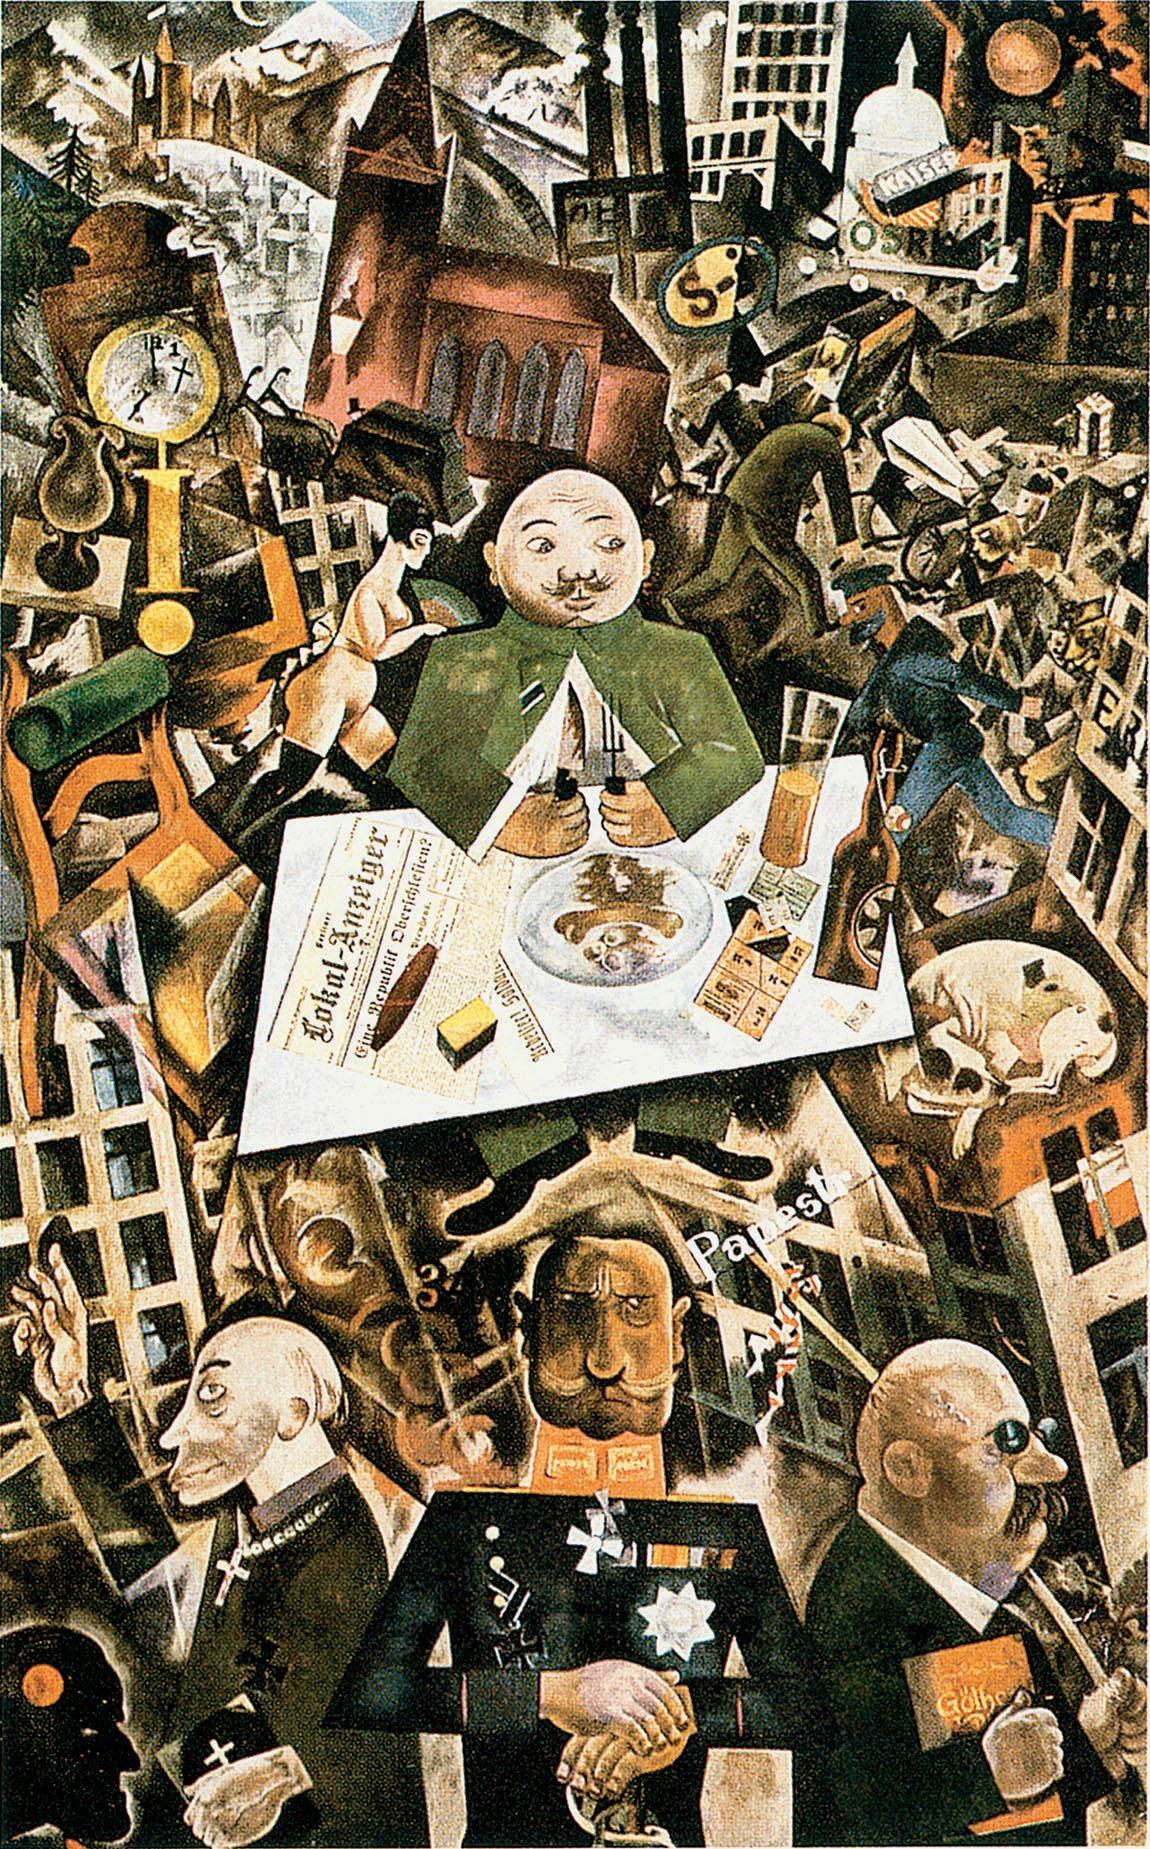 Pin en Max Beckmann, Otto Dix, George Grosz